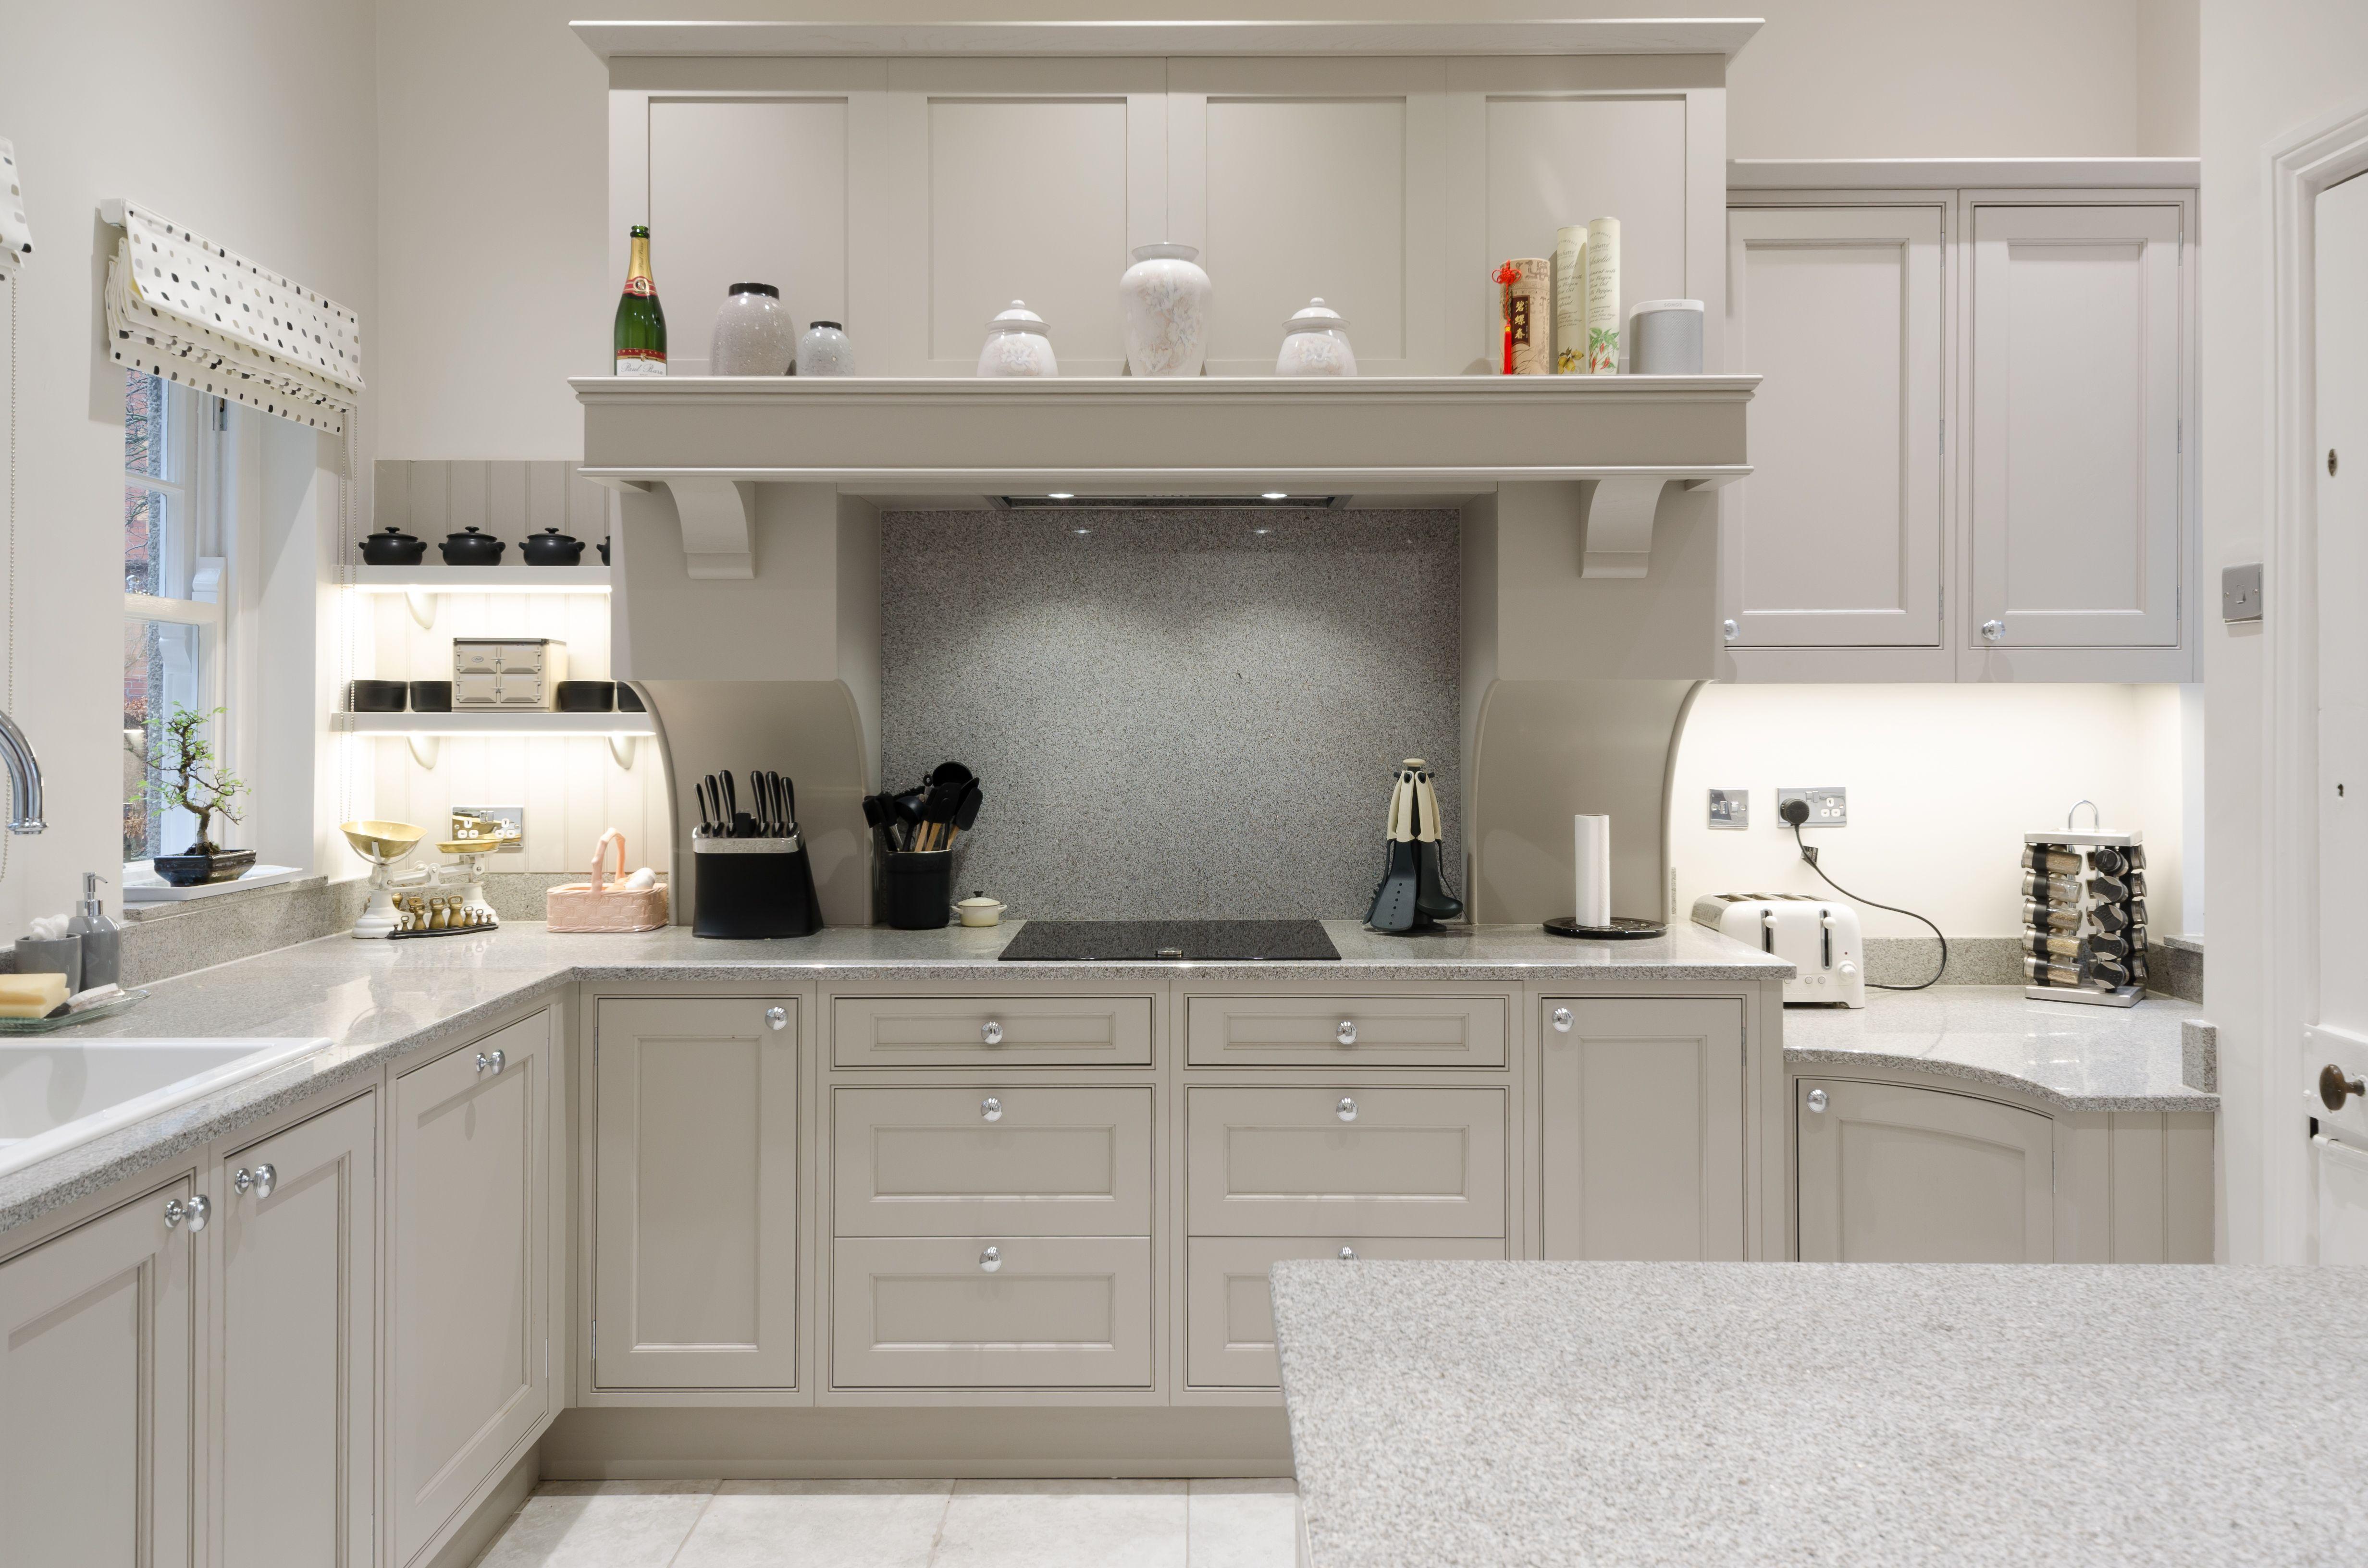 Best Wentworth Painted Purbeck Stone Kitchen Kitchen Cabinets 400 x 300